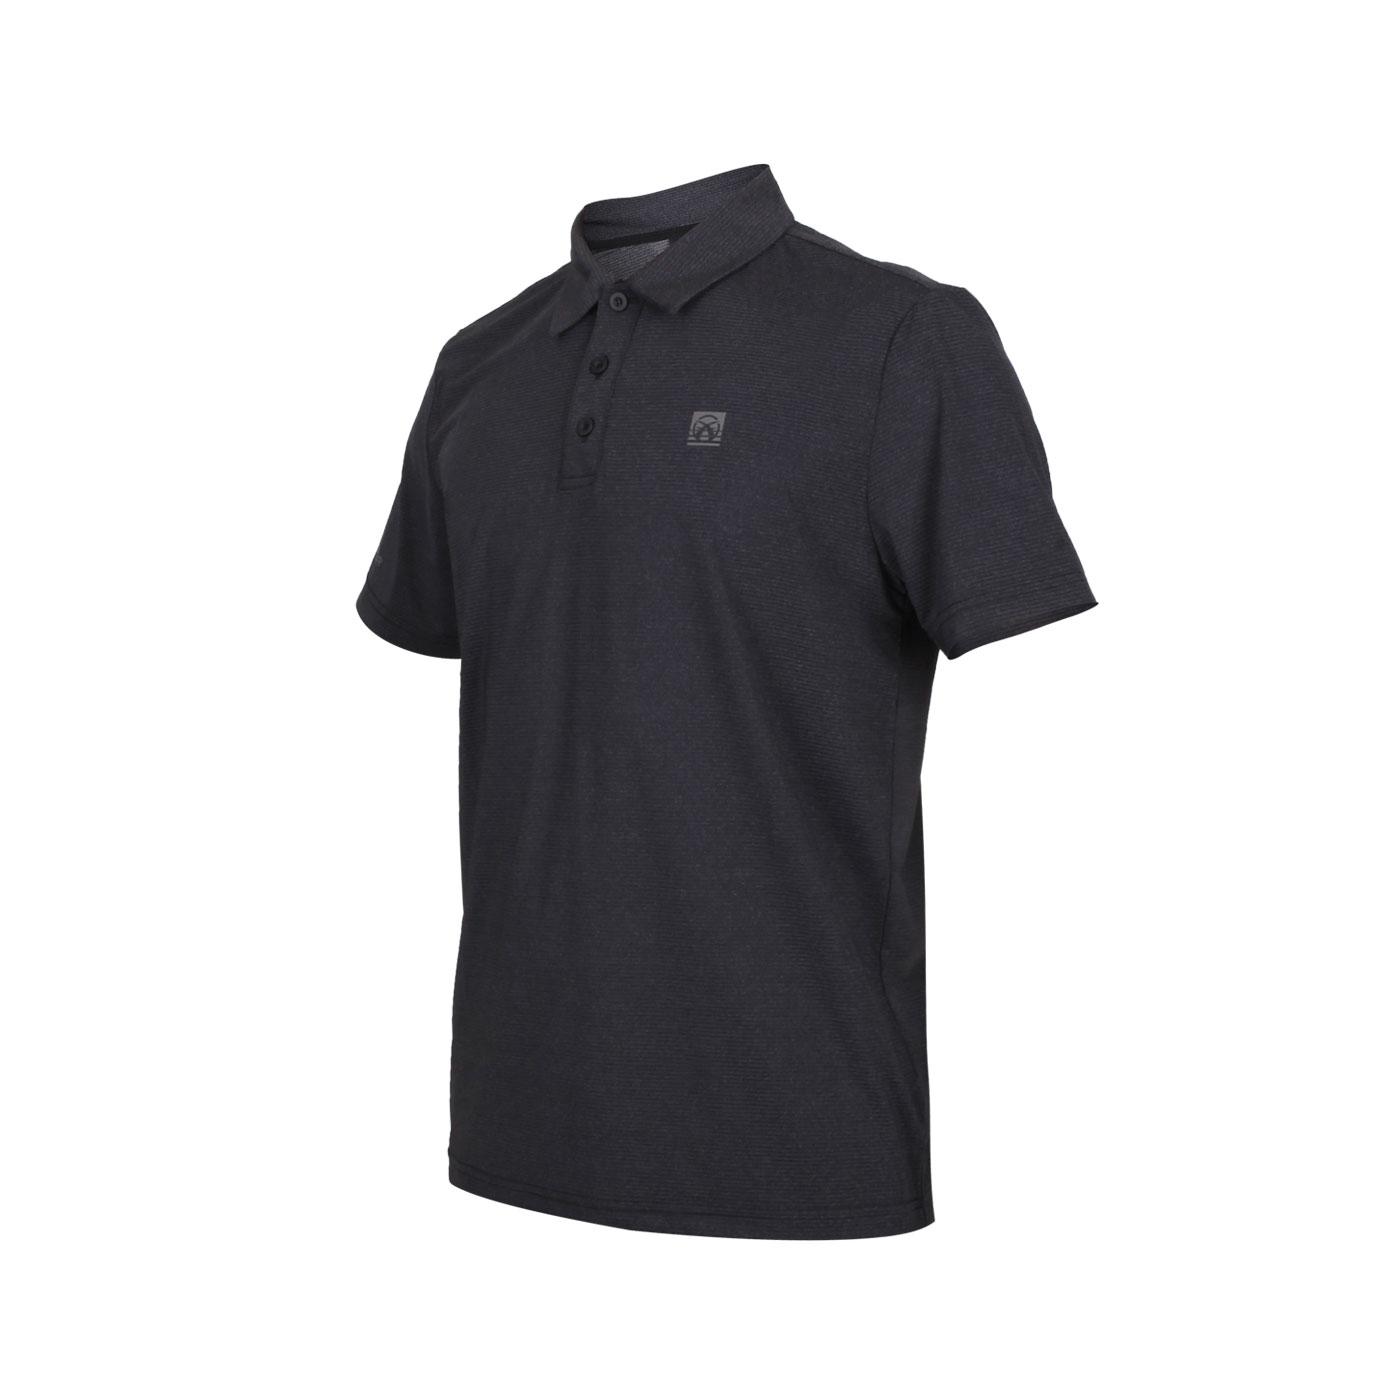 FIRESTAR 男款彈性短袖POLO衫 D0551-18 - 深麻灰